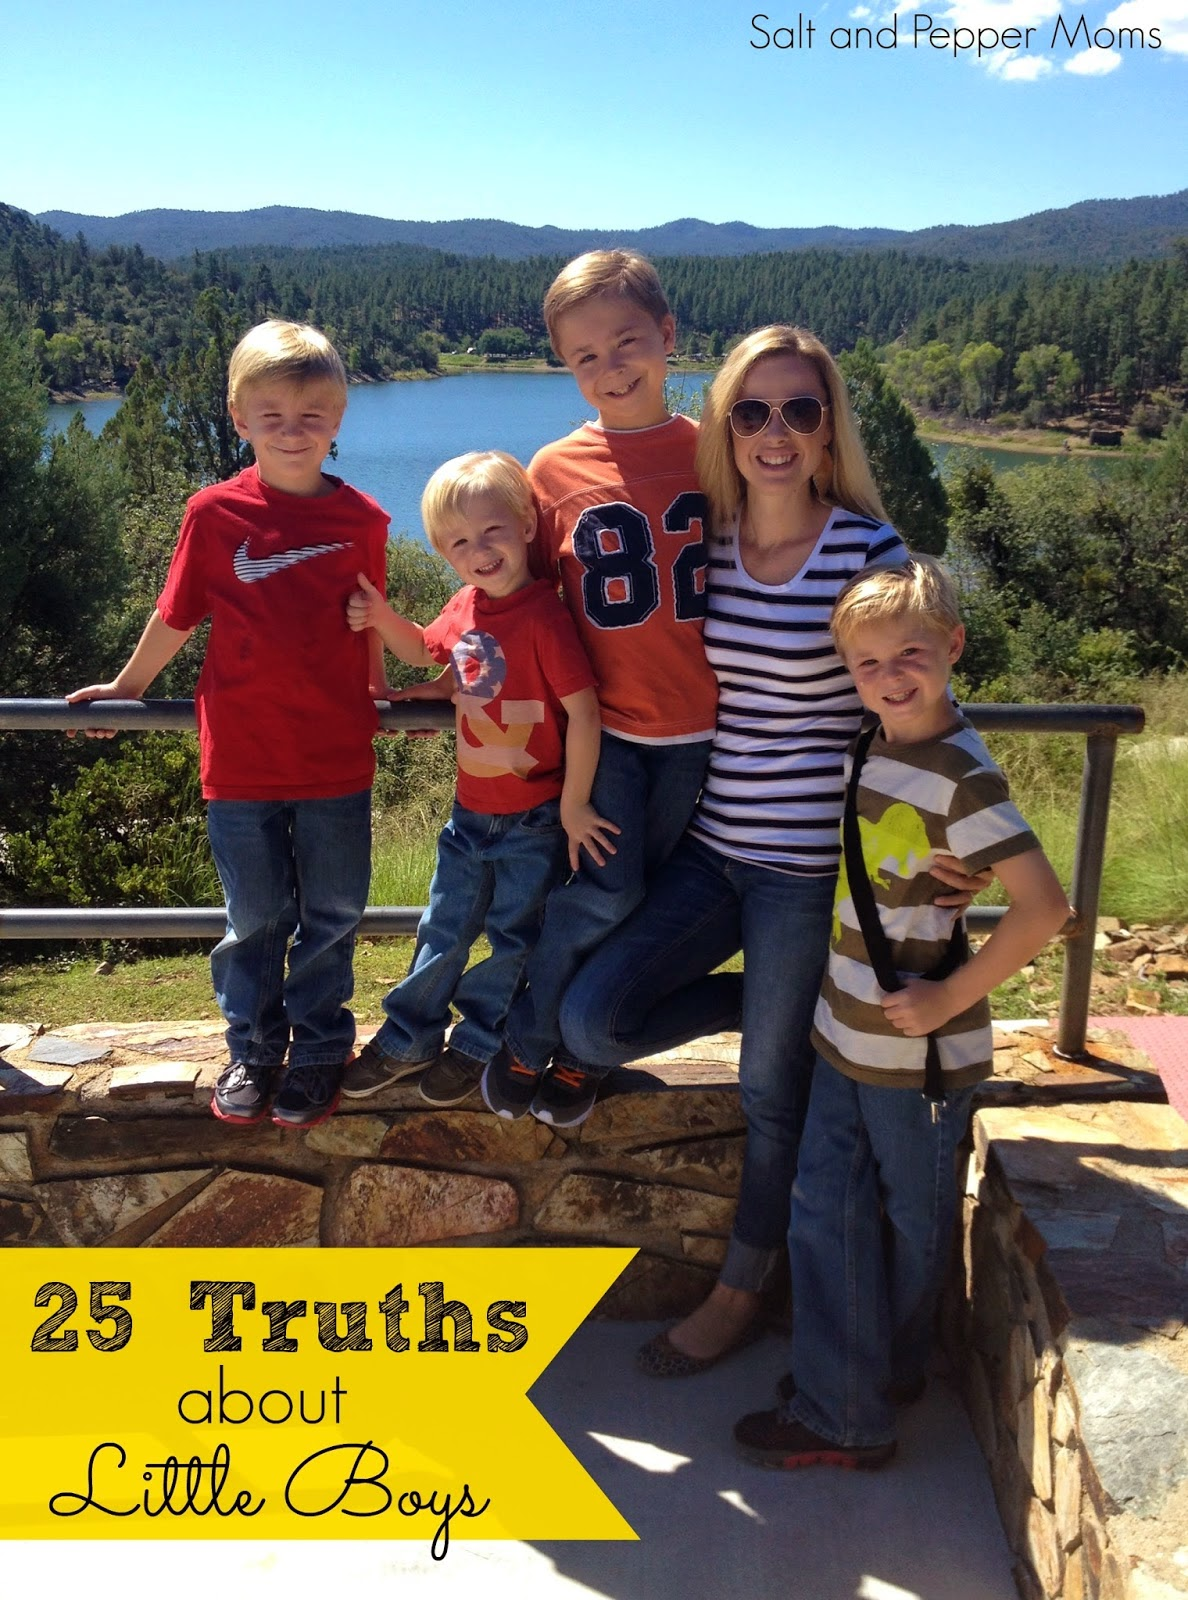 http://saltandpeppermoms.blogspot.com/2014/09/25-truths-about-boys.html